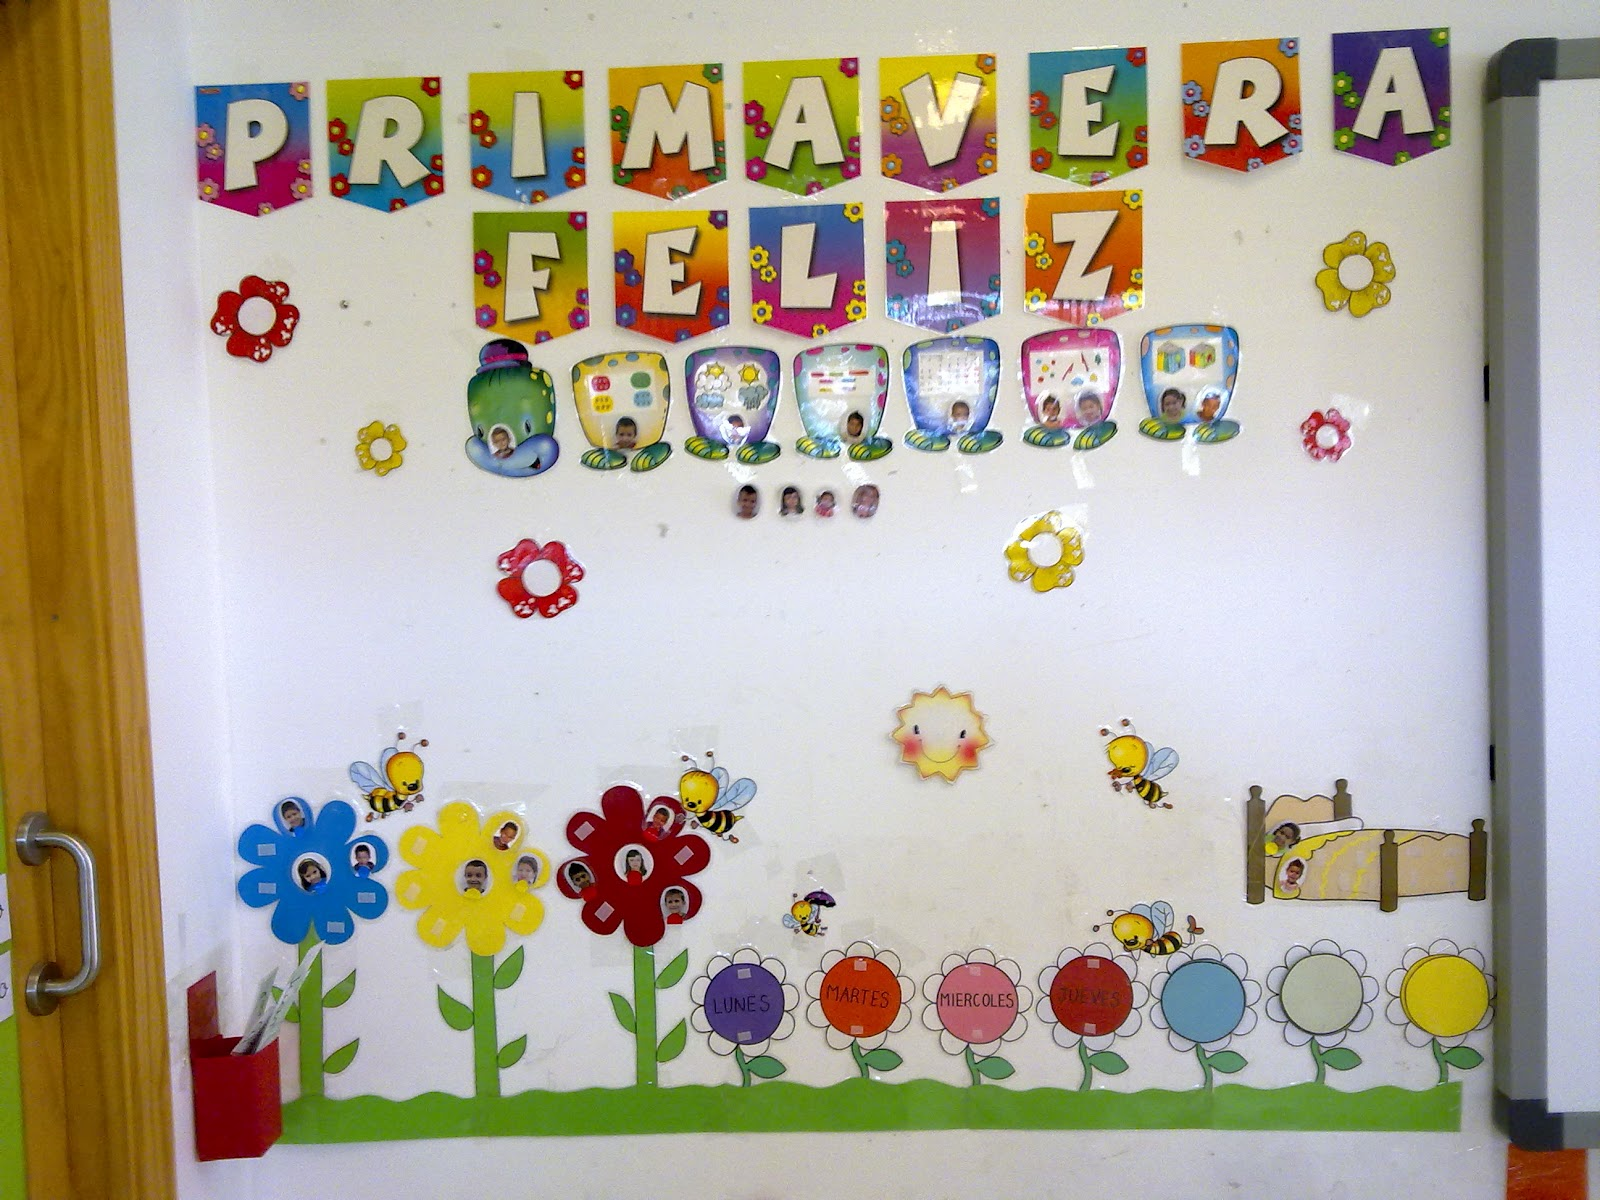 Primavera murales 10 imagenes educativas - Murales con fotos ...